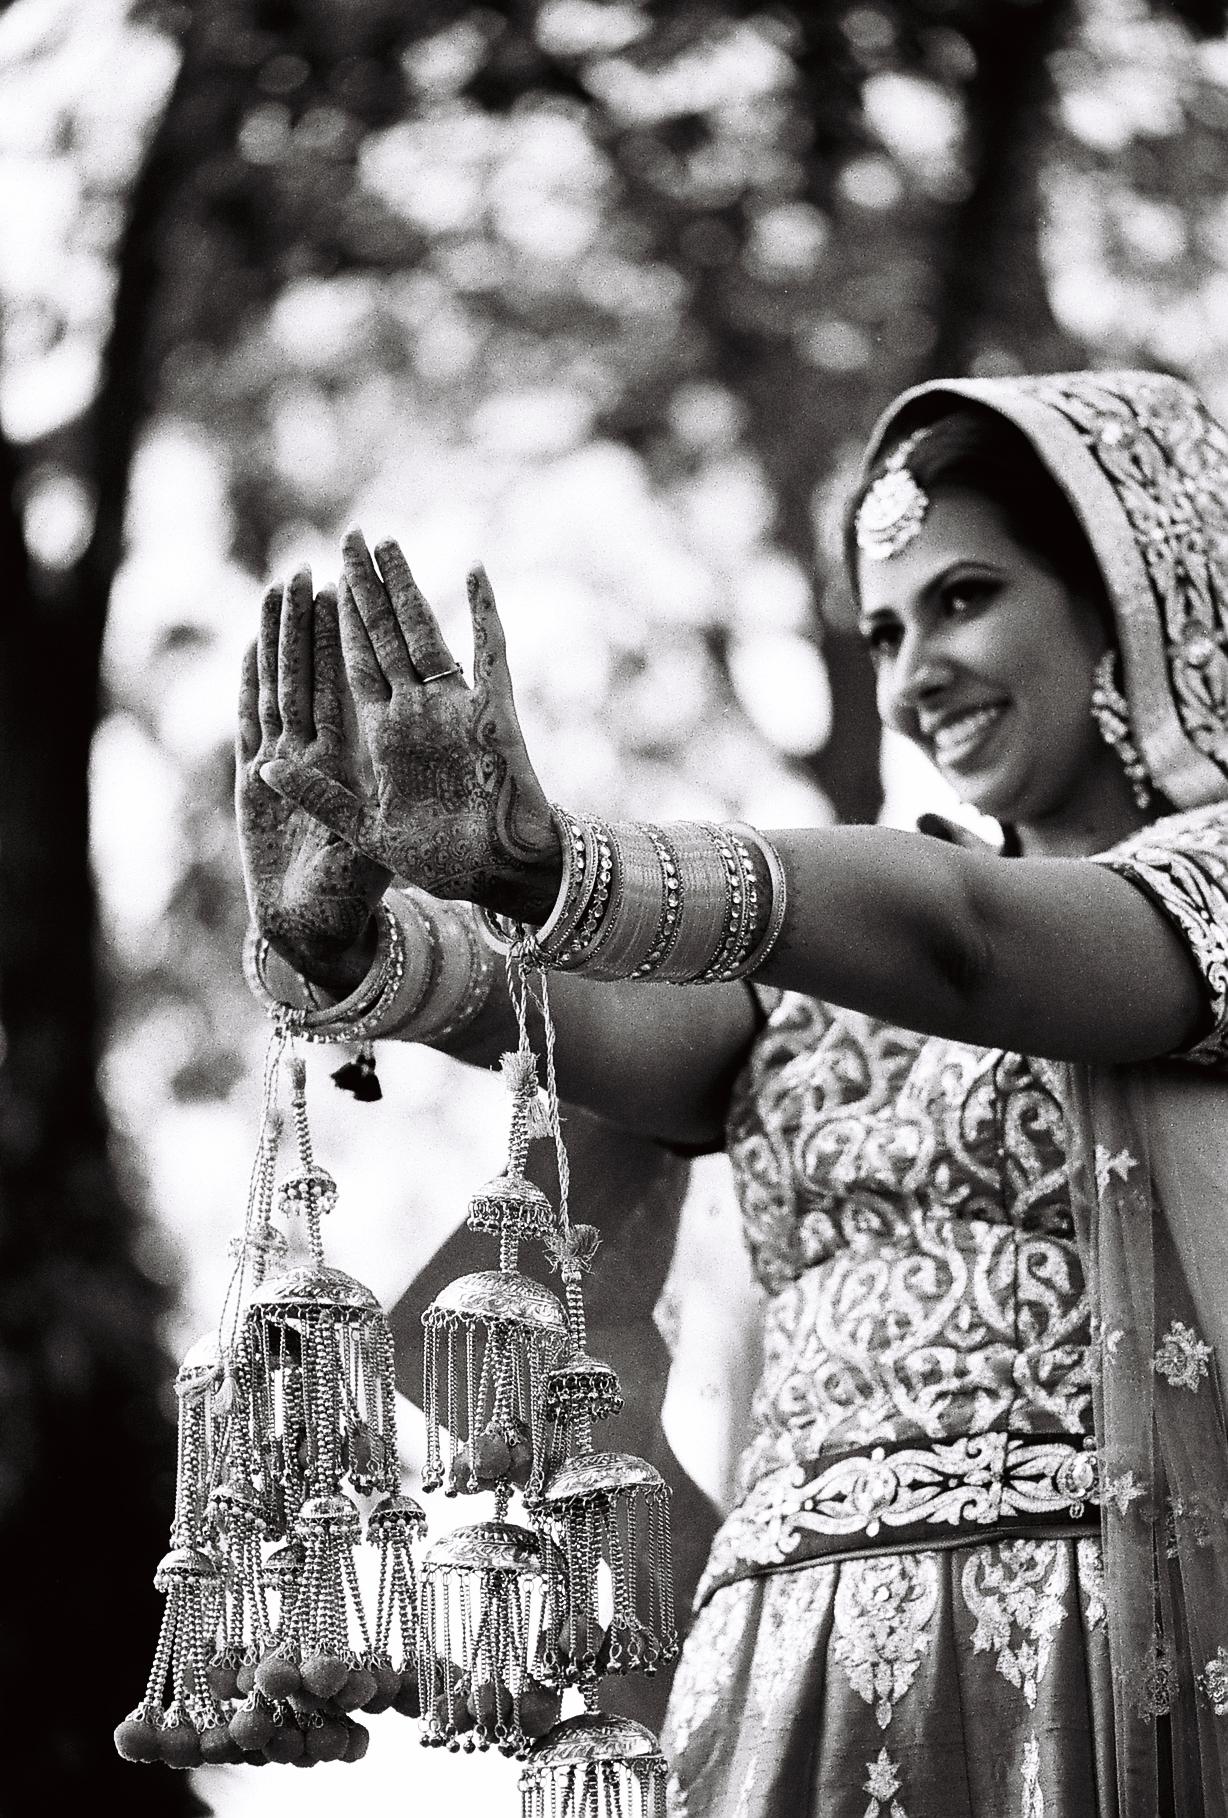 Sim's chooda & kalire were fine designs. Chooda & kalire plays a great significance in sikh & punjabi wedding.